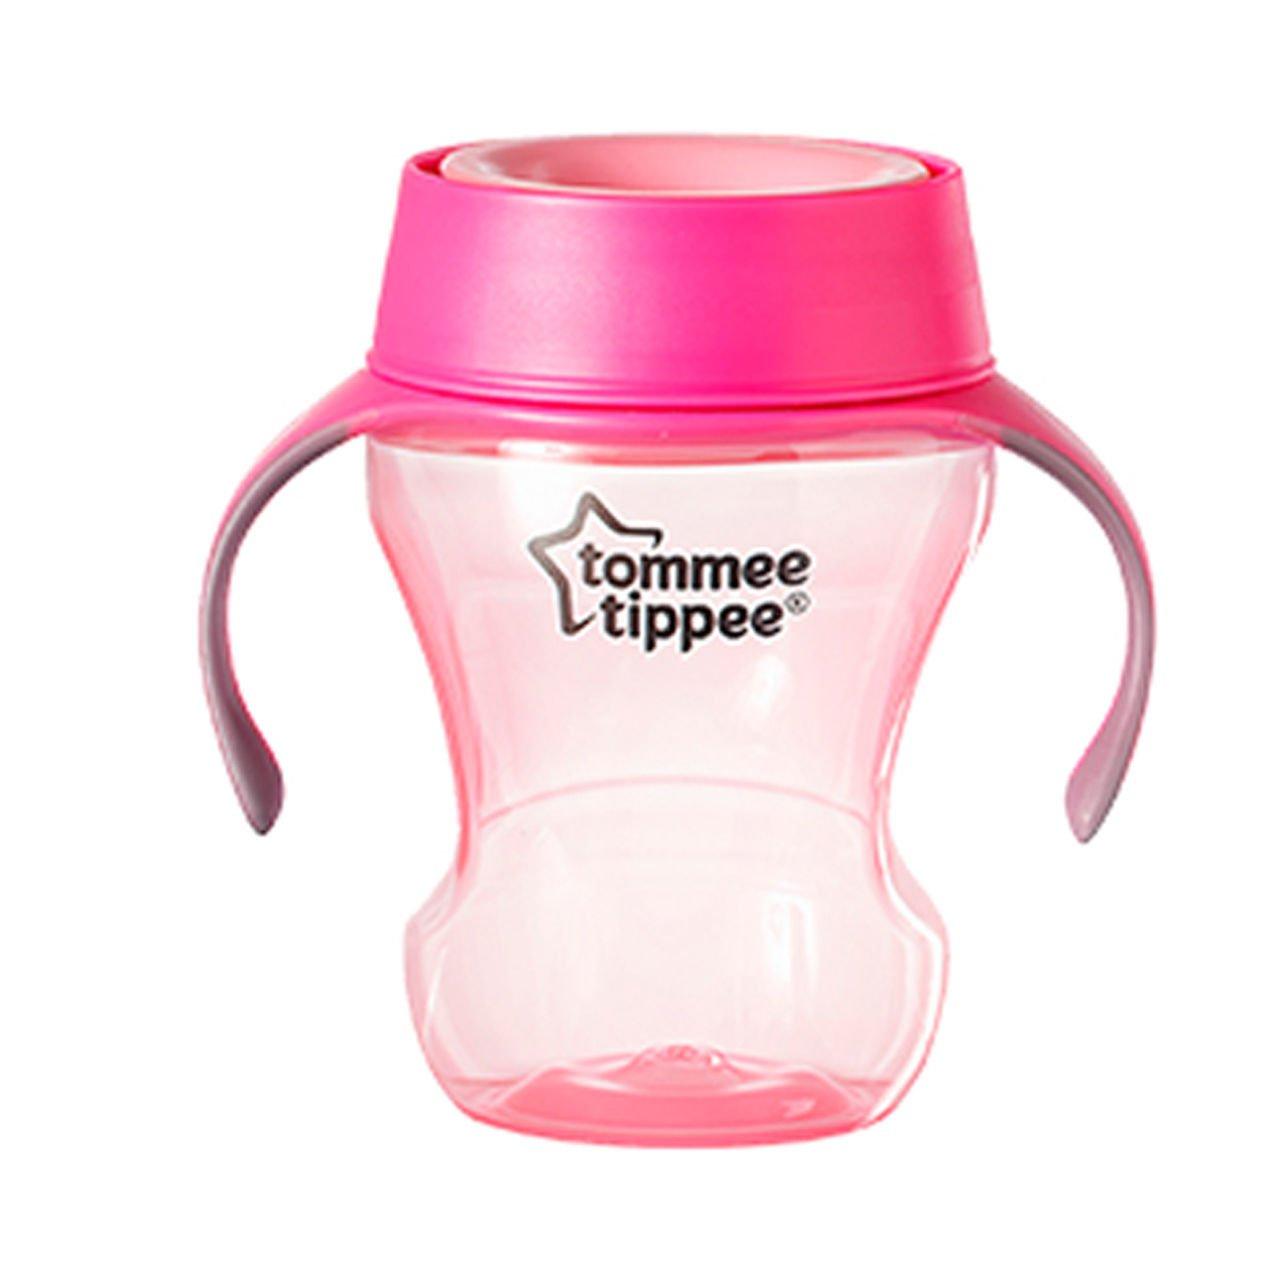 Tommee Tippee 360/Trainer Tasse